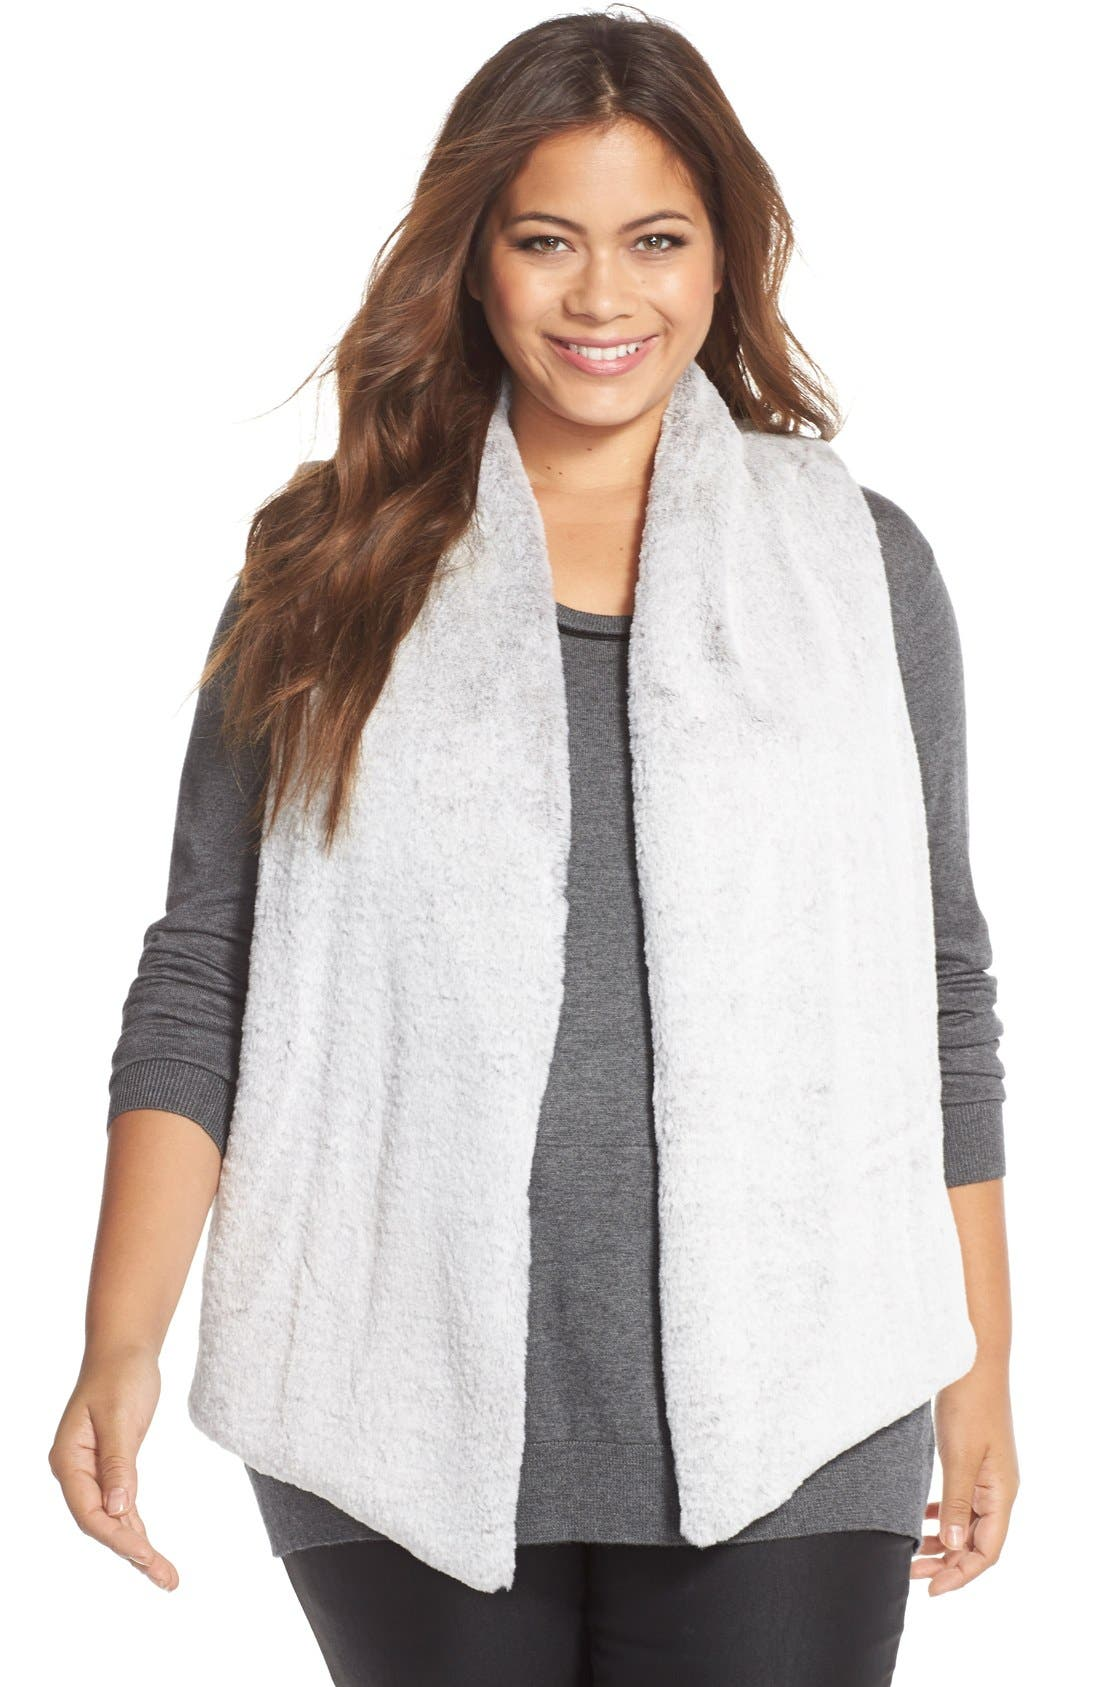 TART 'Kya' Faux Fur Vest in Natural Grey